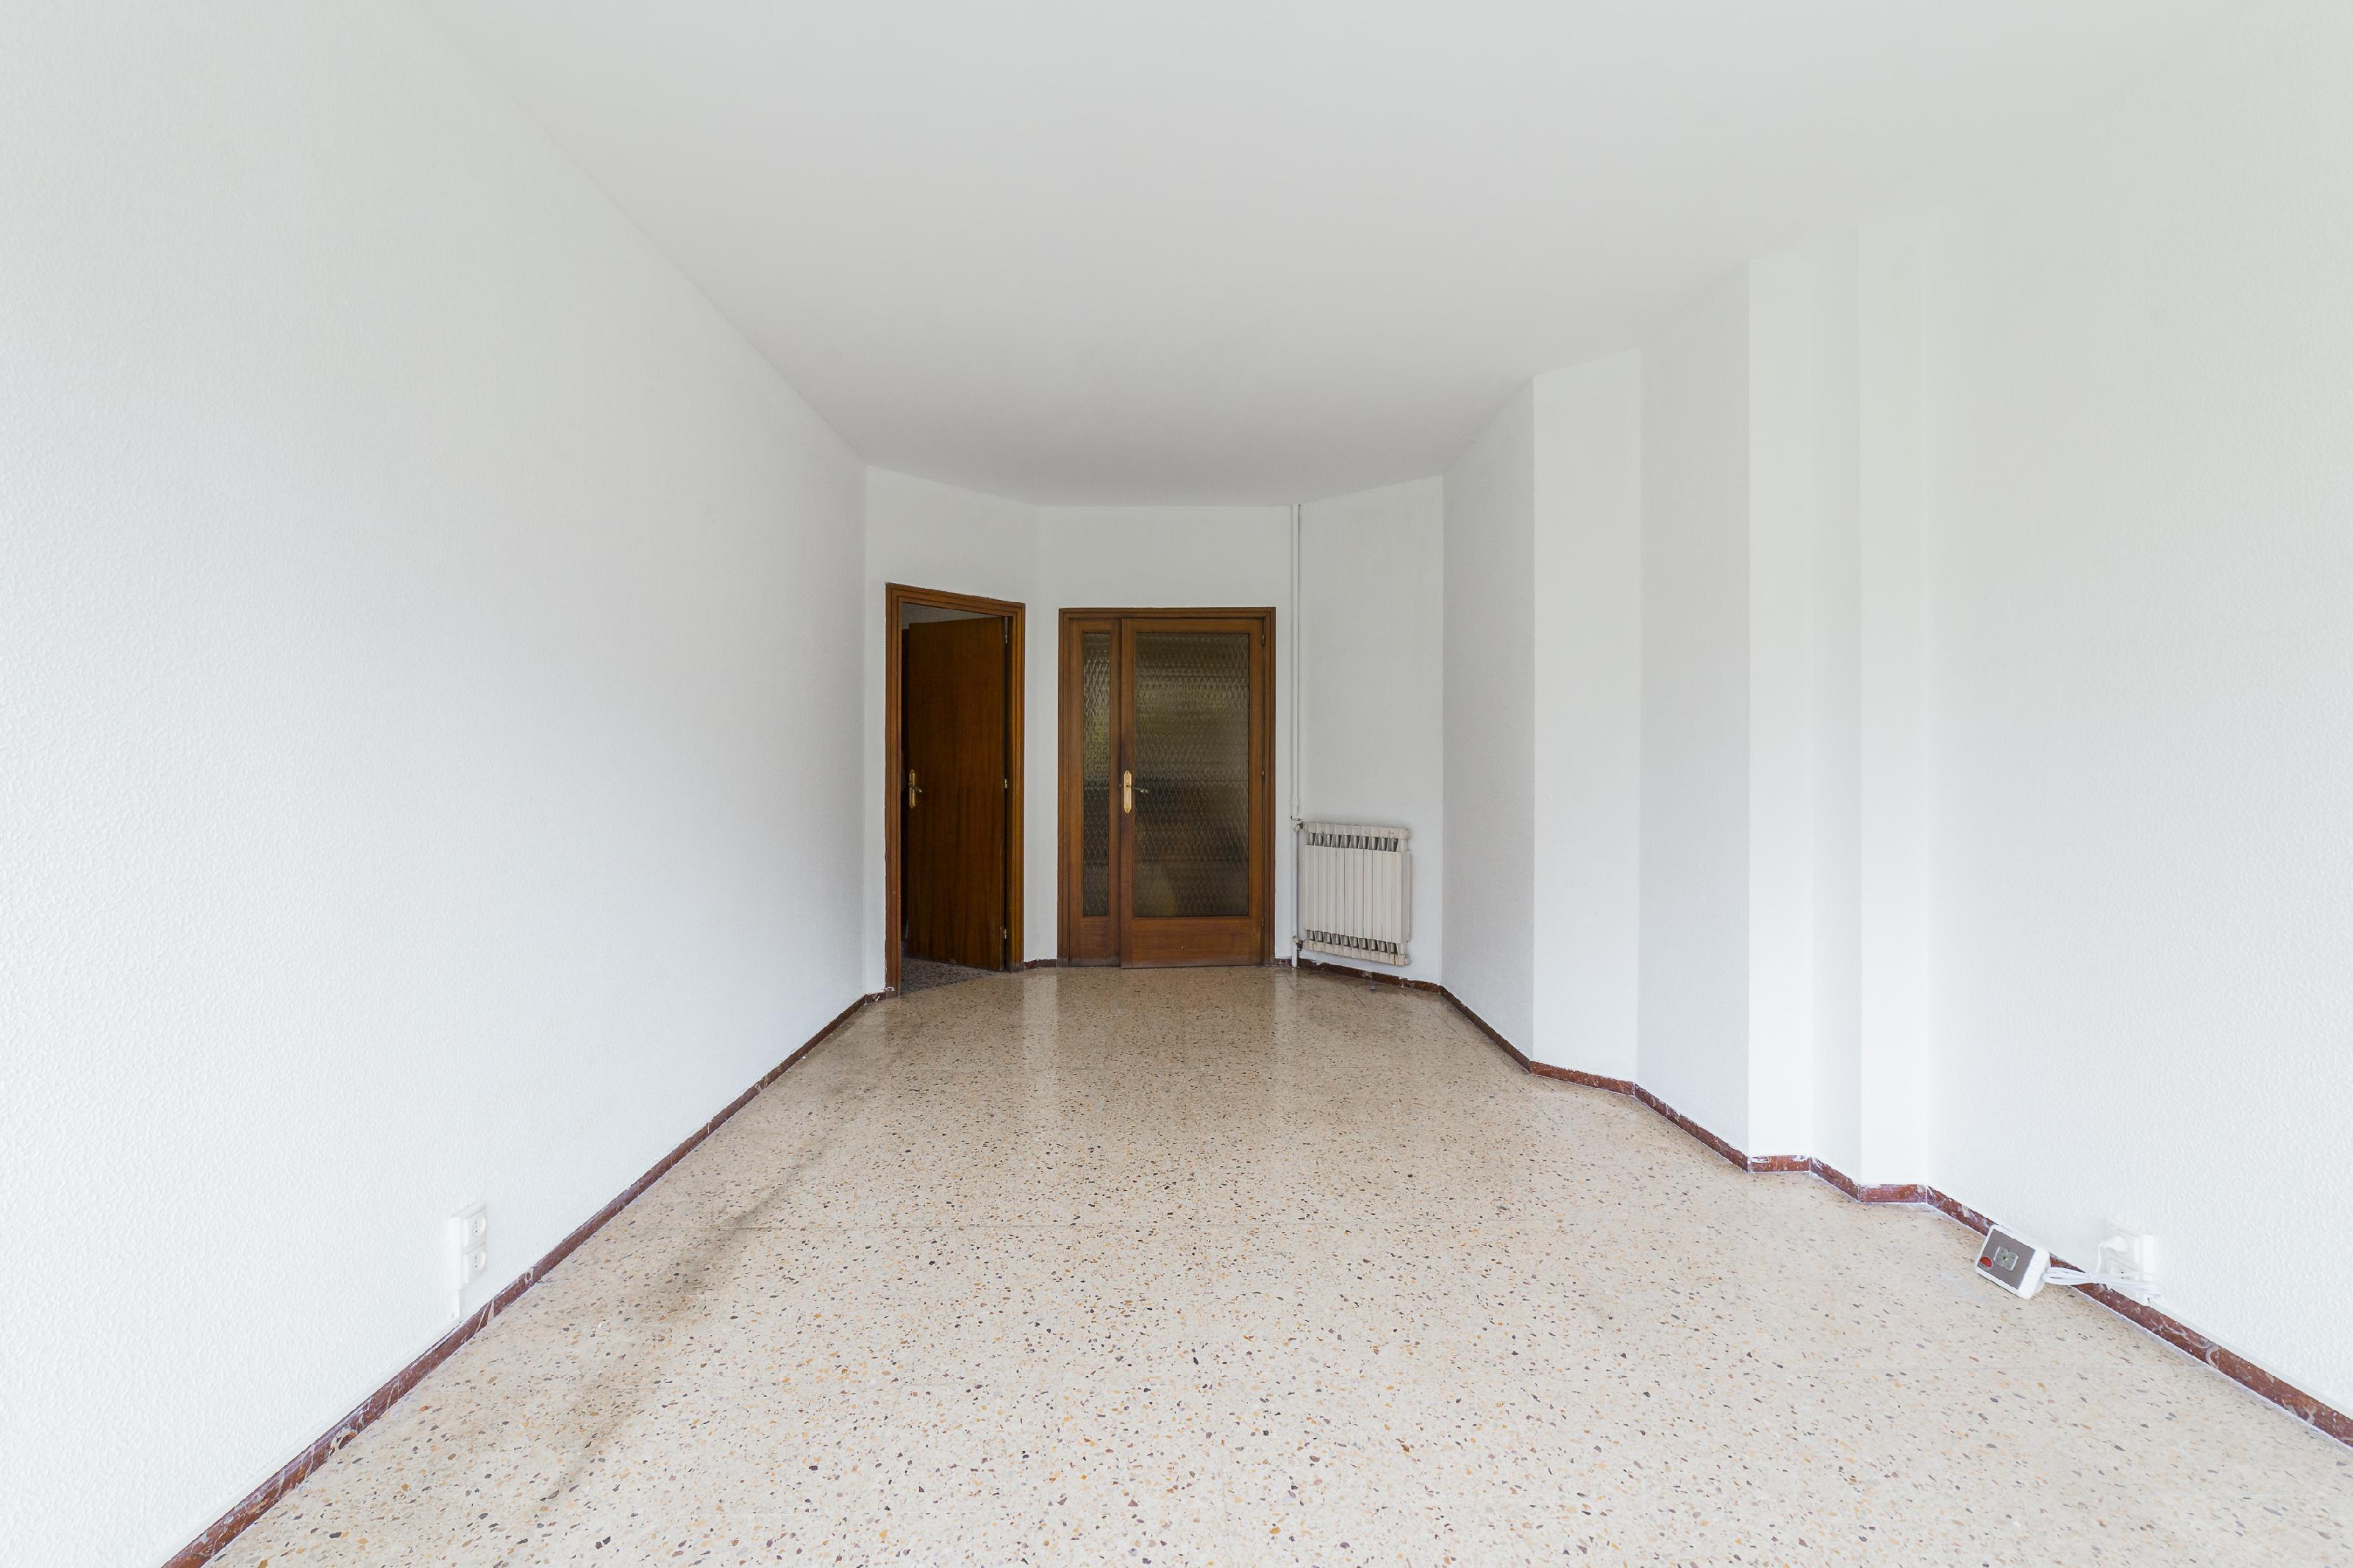 247624 Flat for sale in Eixample, Sant Antoni 7